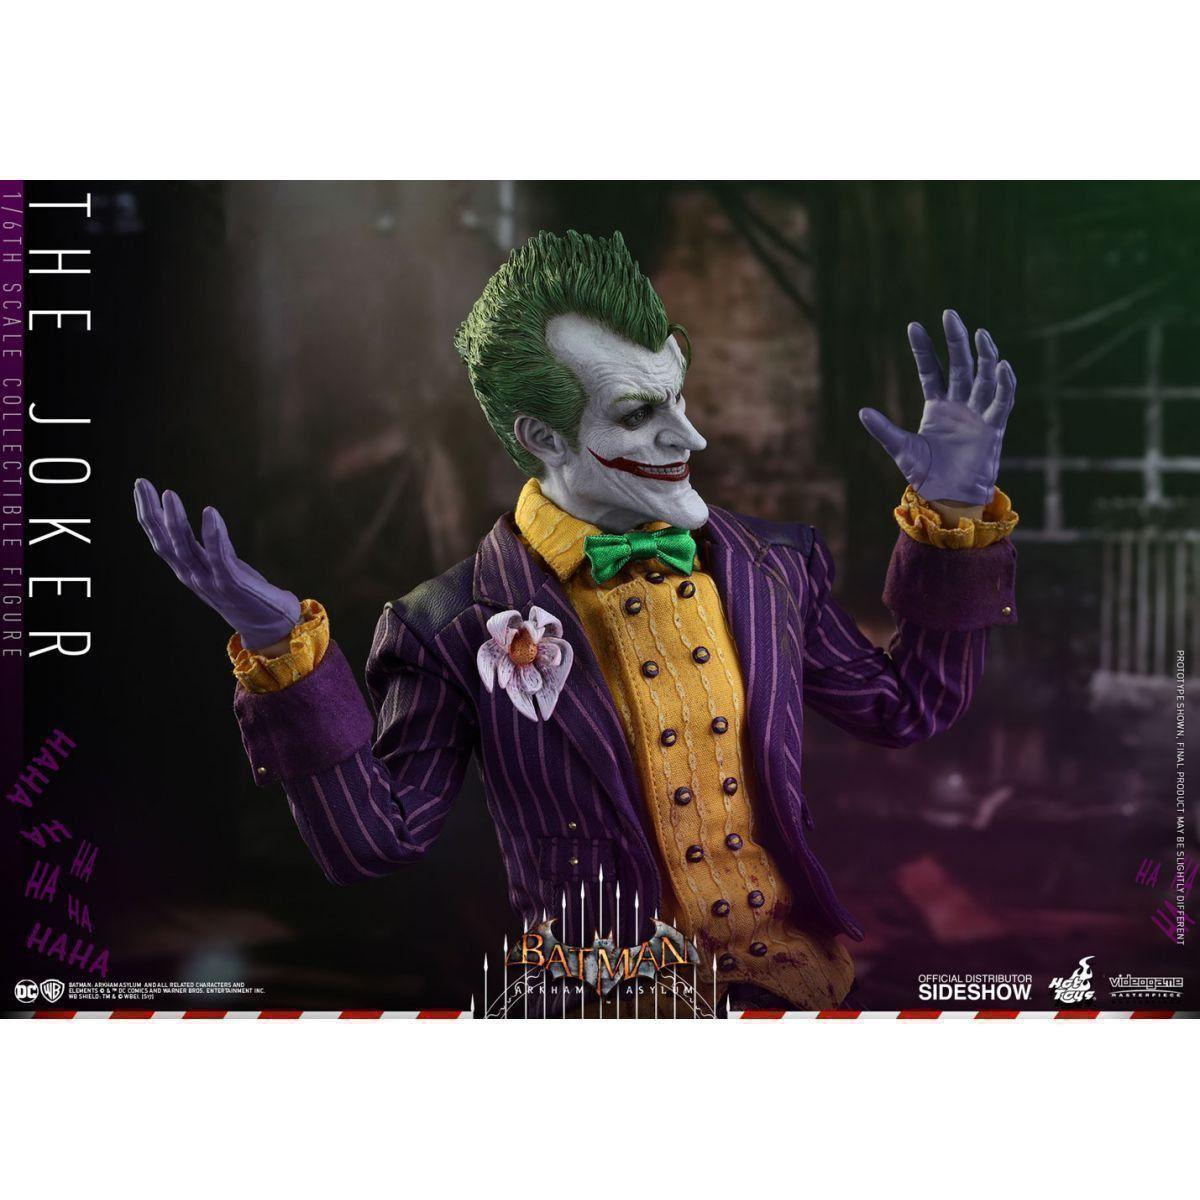 PRÉ VENDA: Boneco Coringa (The Joker): Batman Arkham Asylum Escala 1/6 - Hot Toys